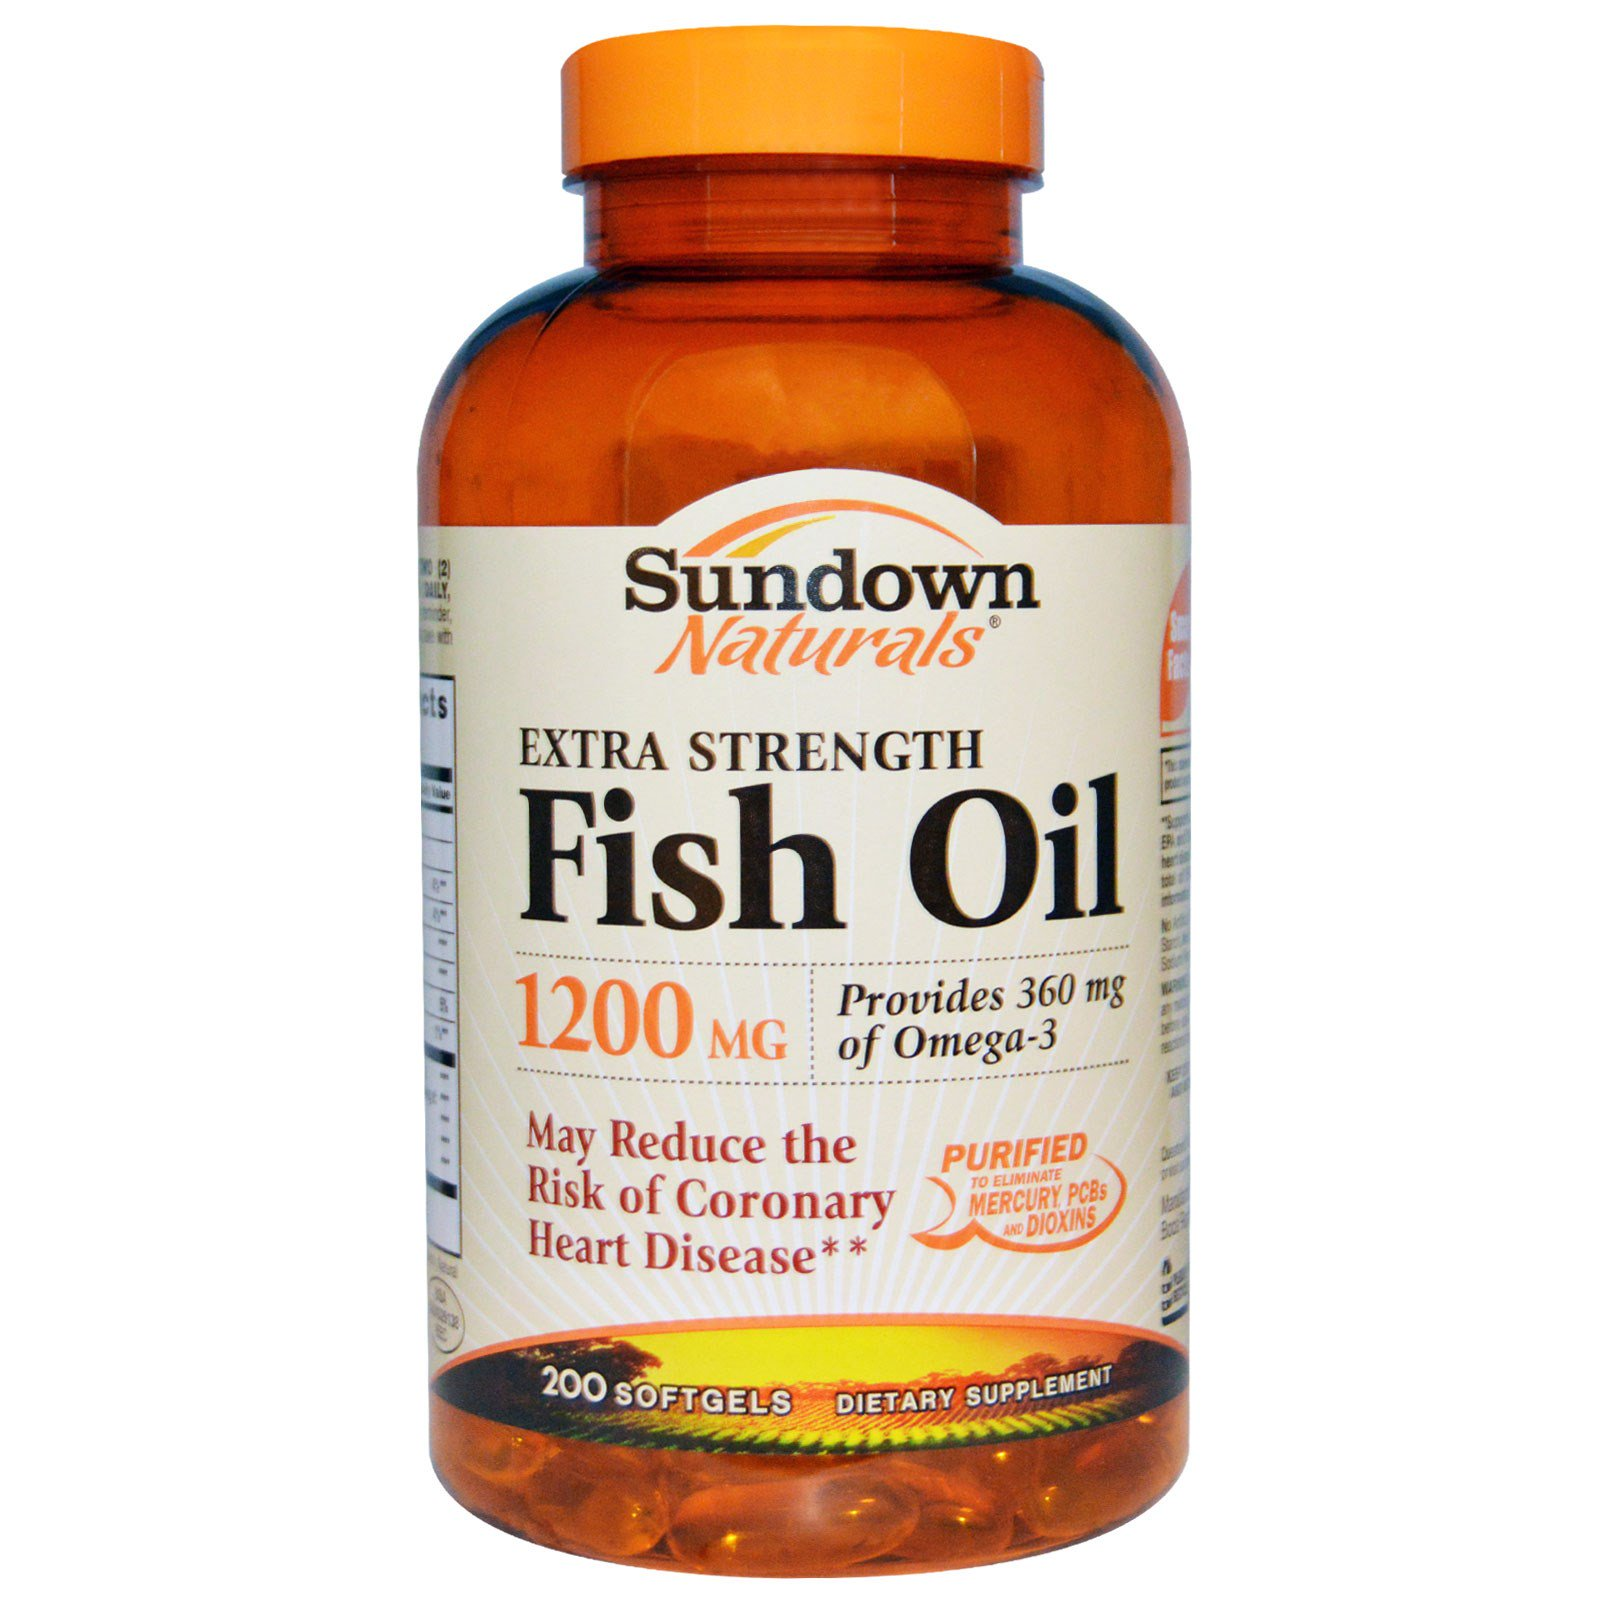 Sundown Naturals Extra Strength Fish Oil Reviews